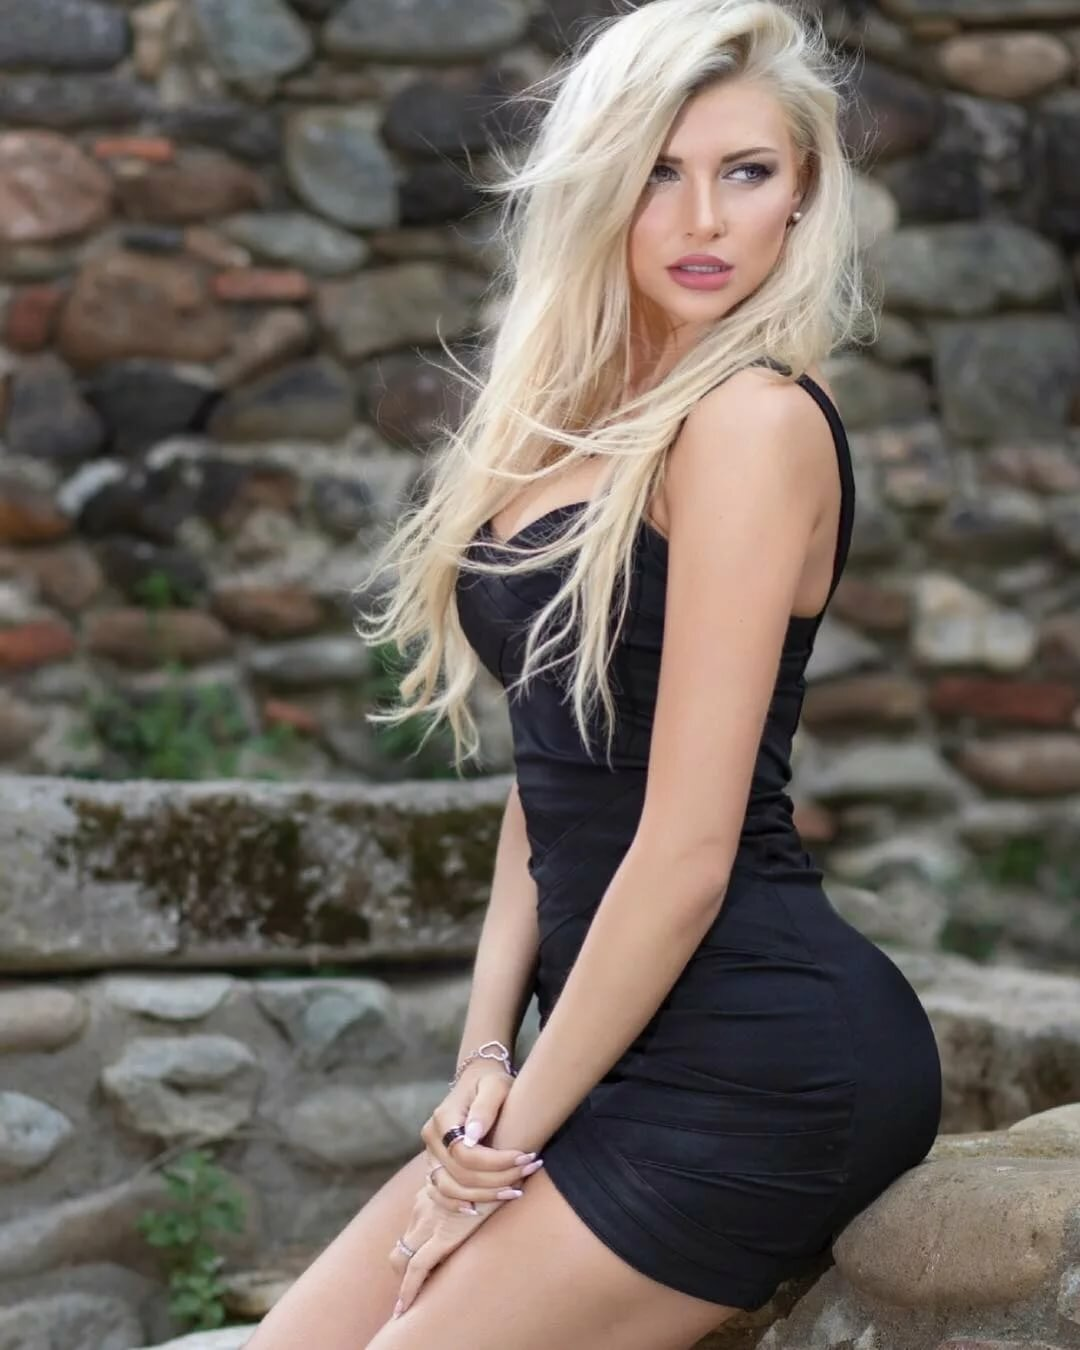 chavvy-blonde-girl-amazon